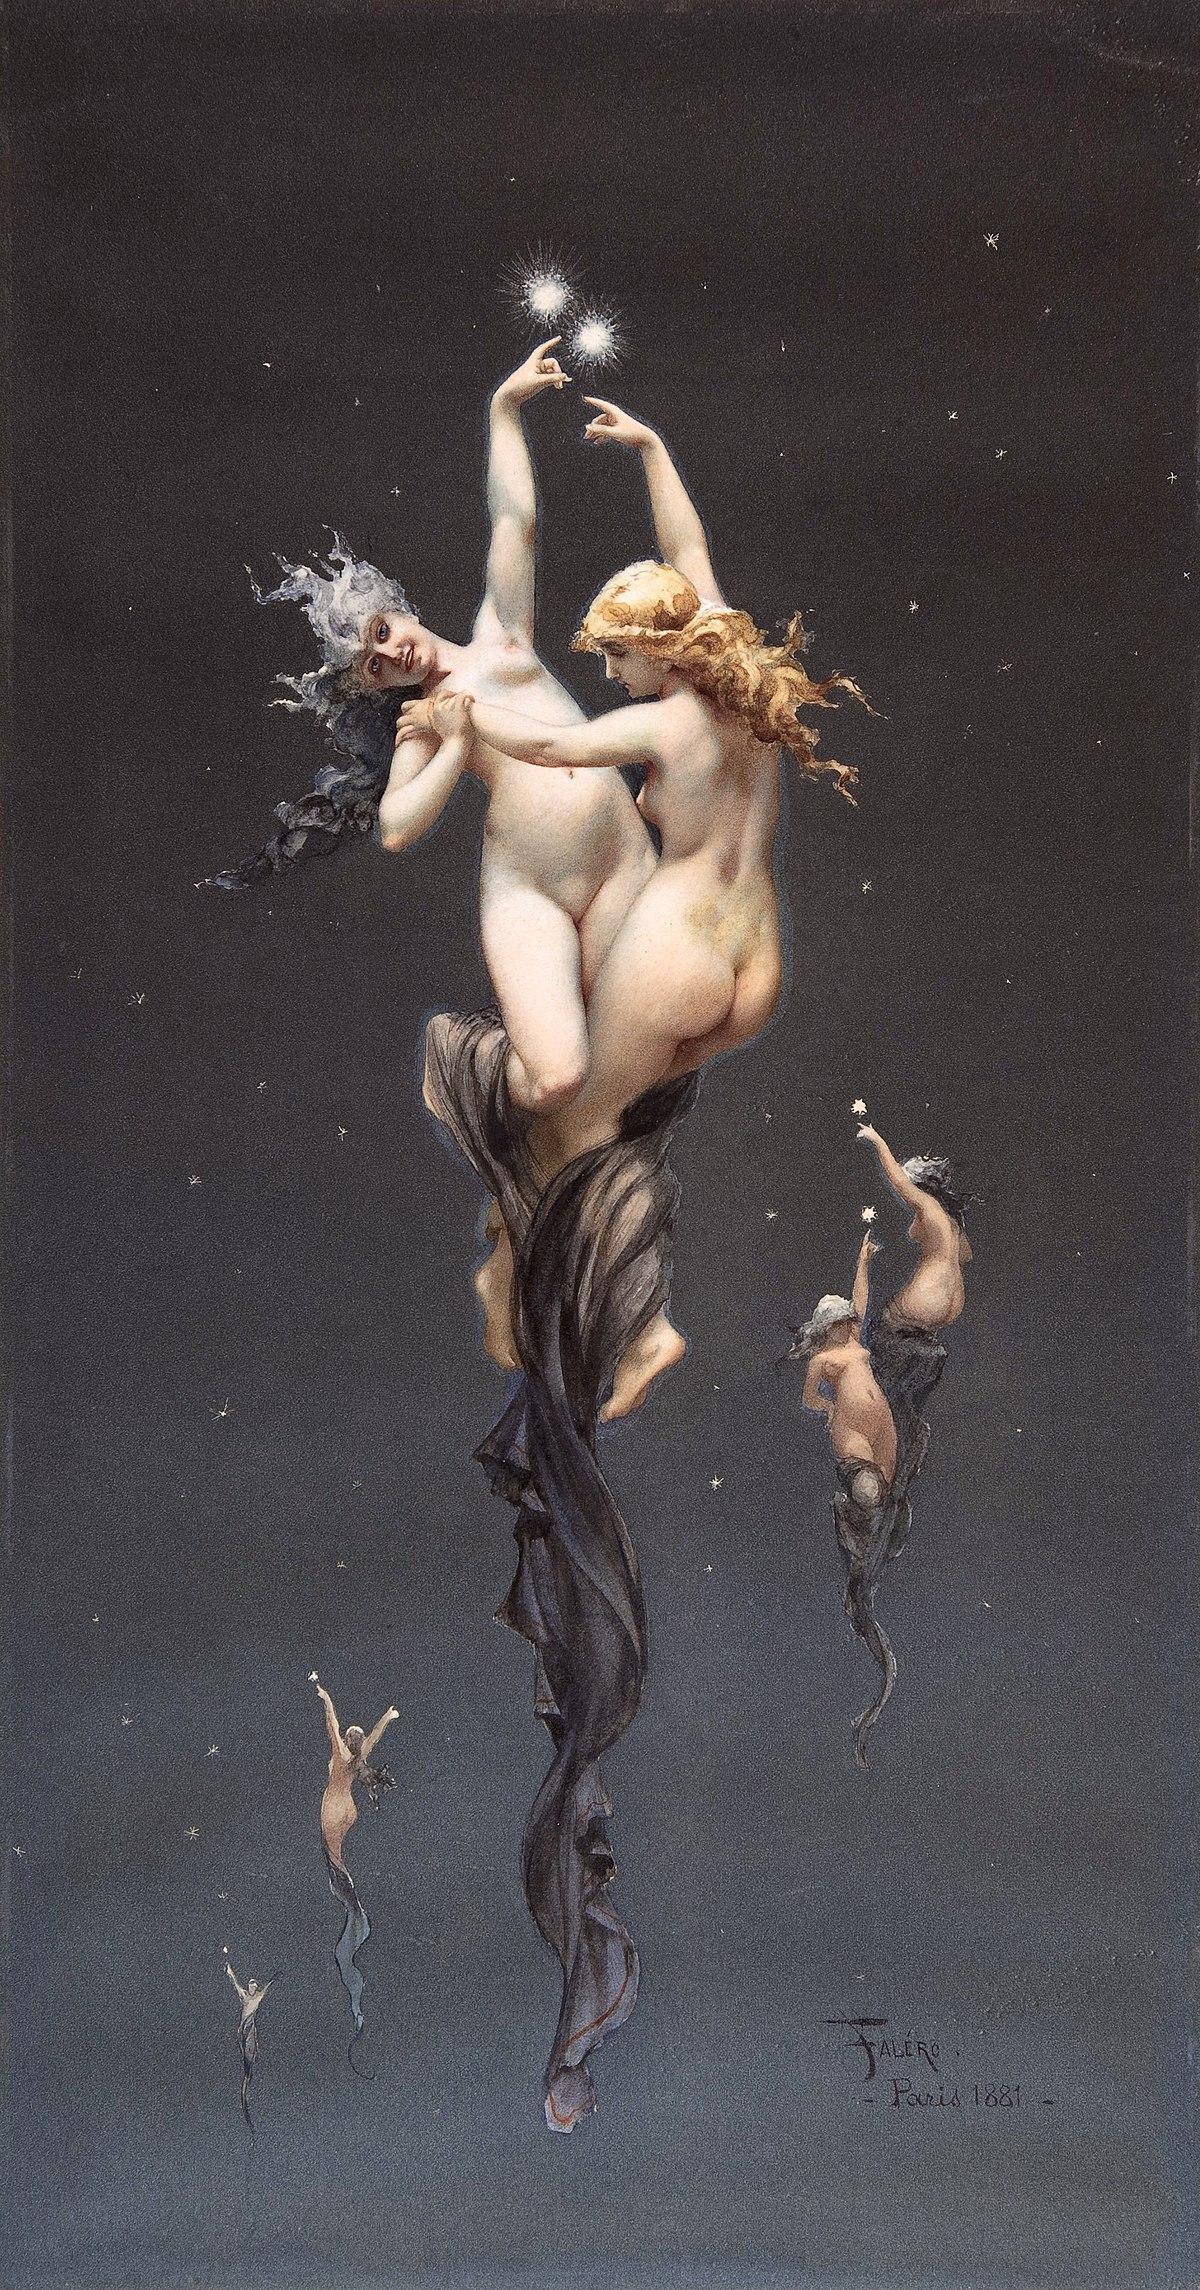 Falero, Luis Ricardo - L'étoile double - 1881.jpg